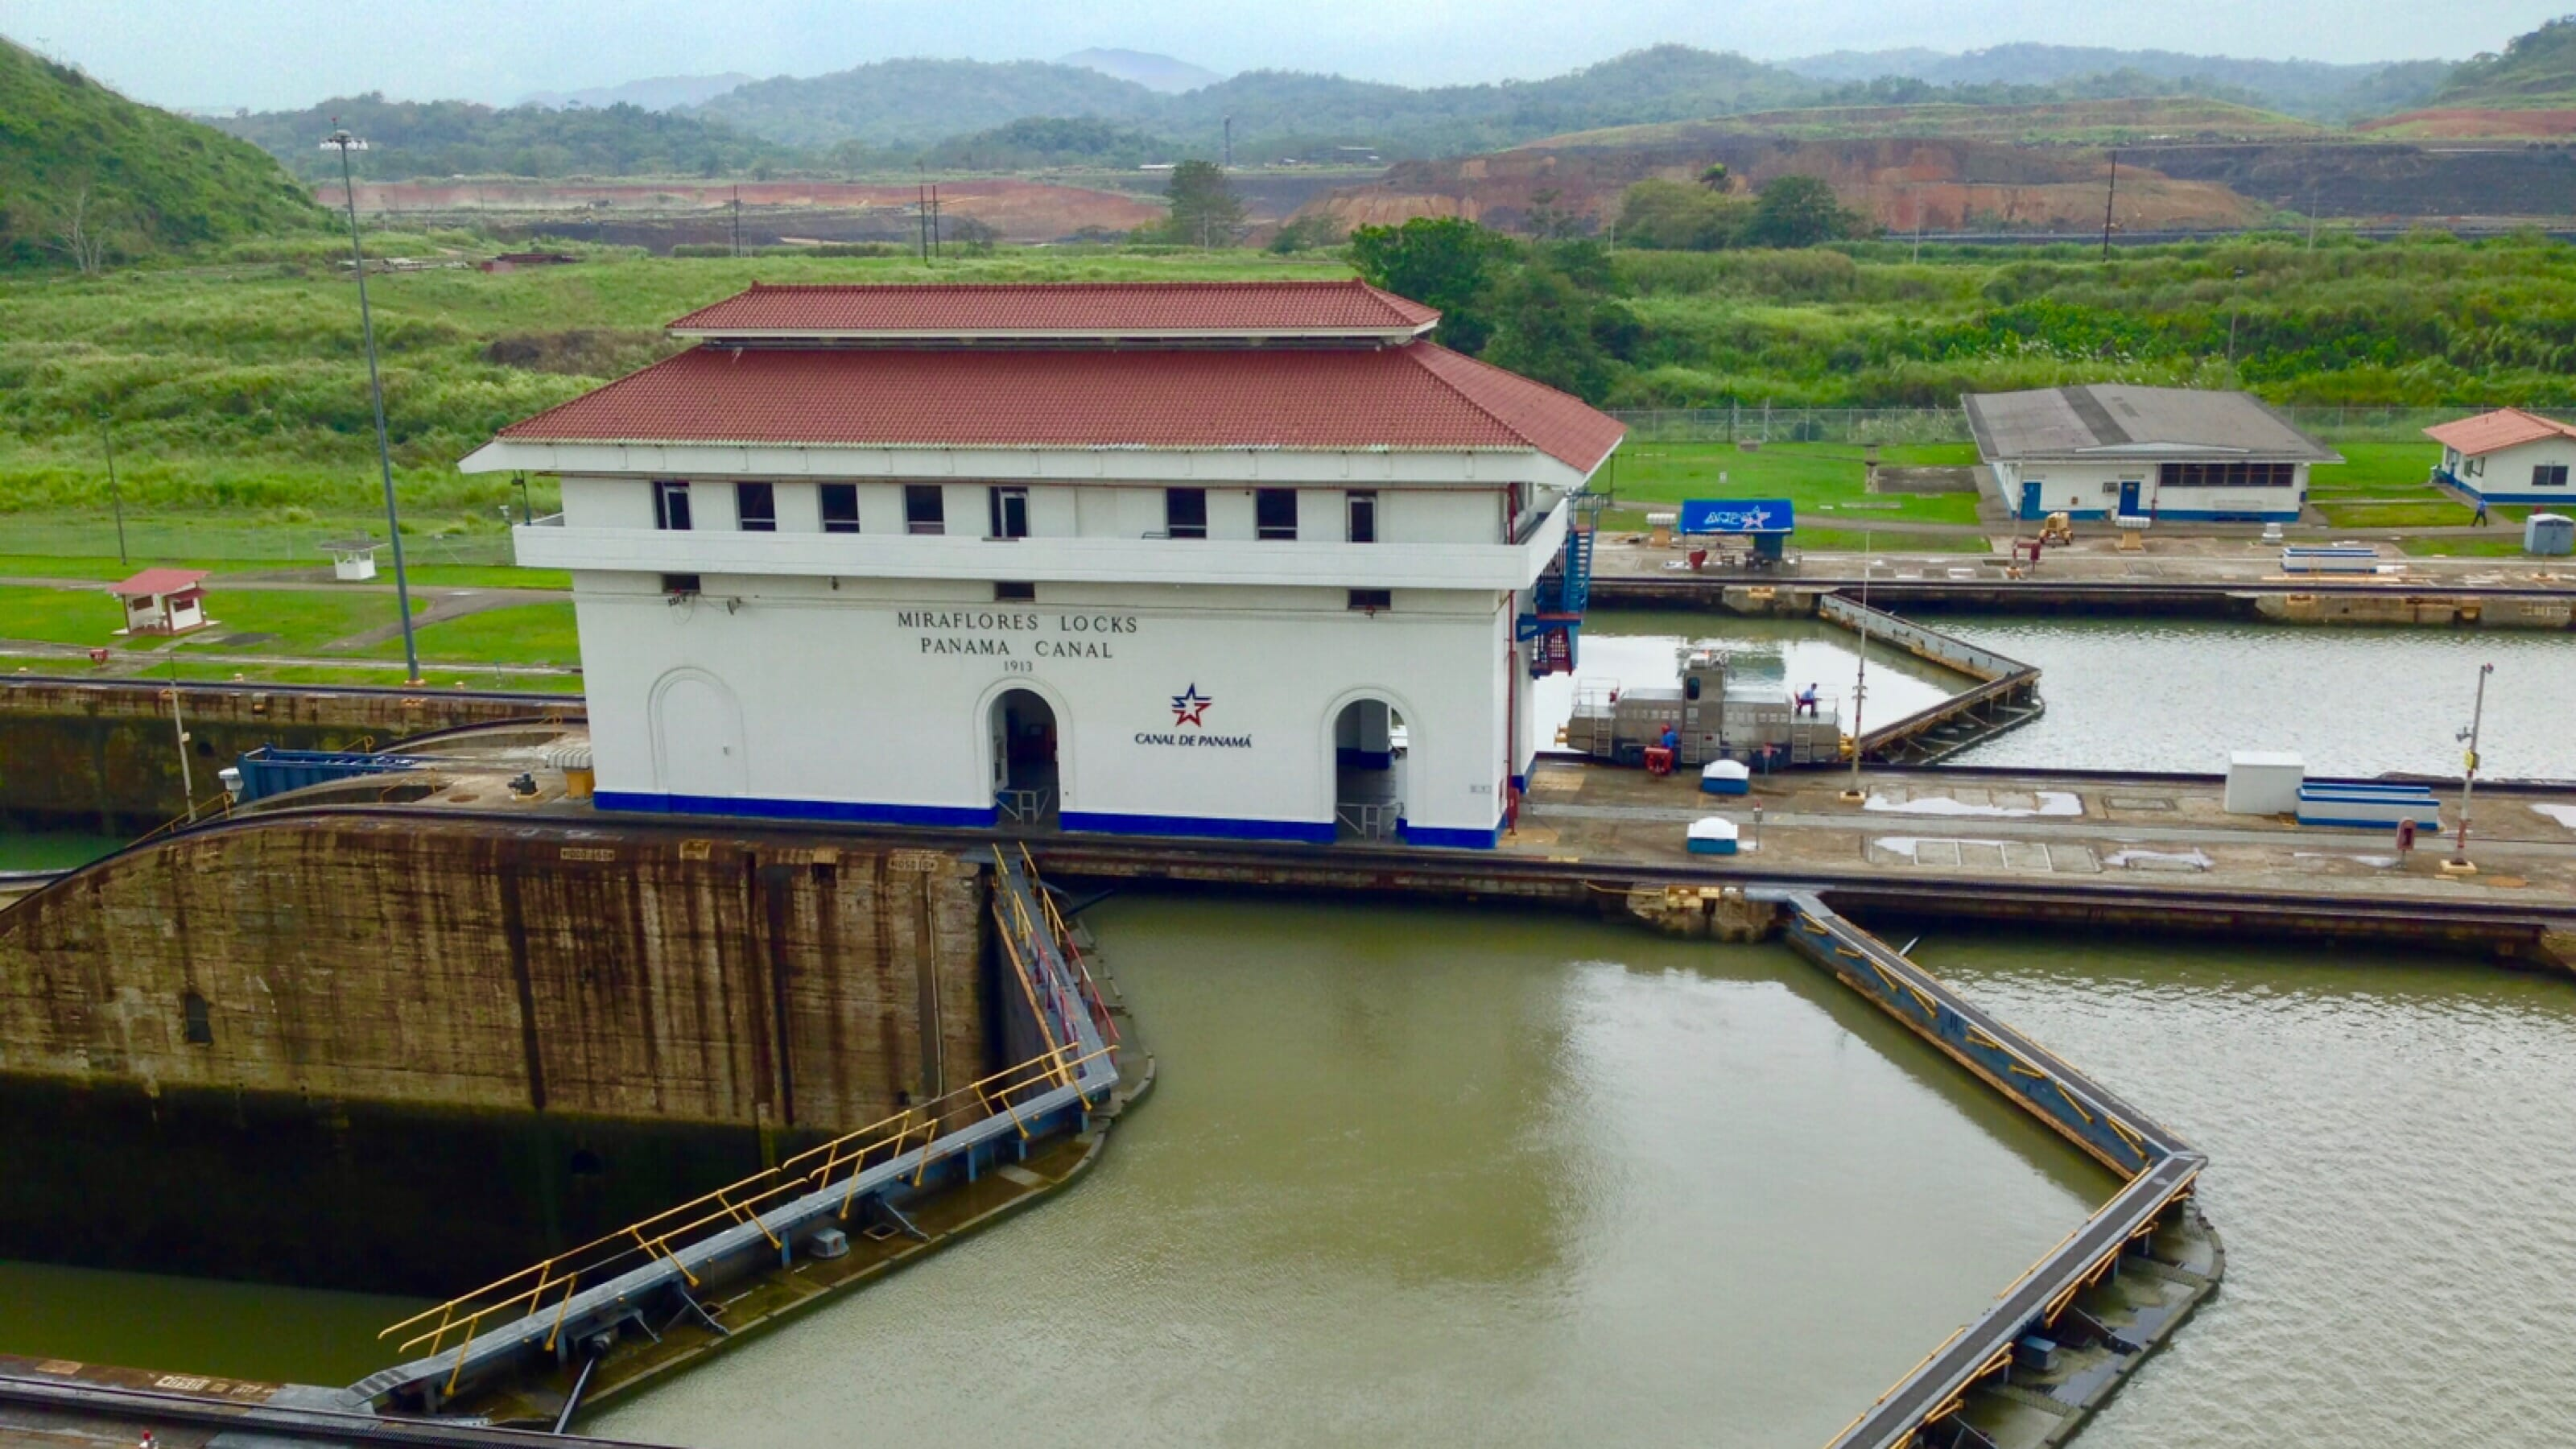 Miraflores Lock, Panama